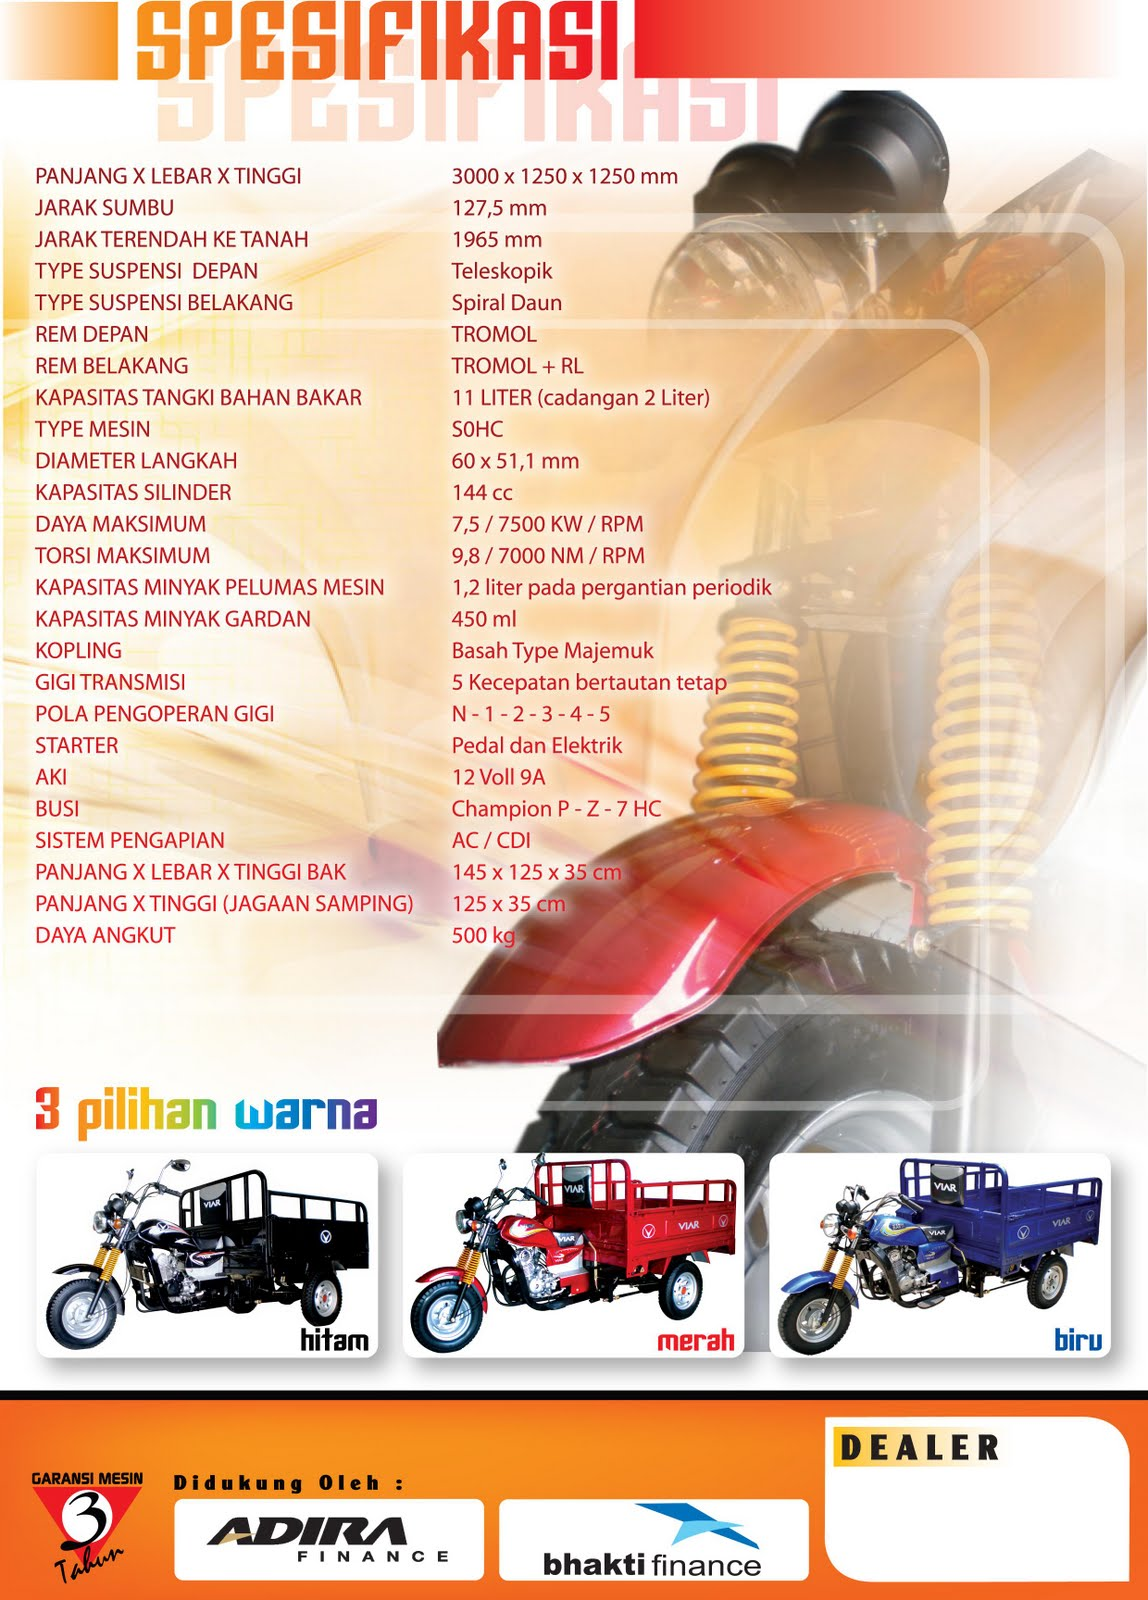 Harga Sepeda Motor Honda Daerah Malang